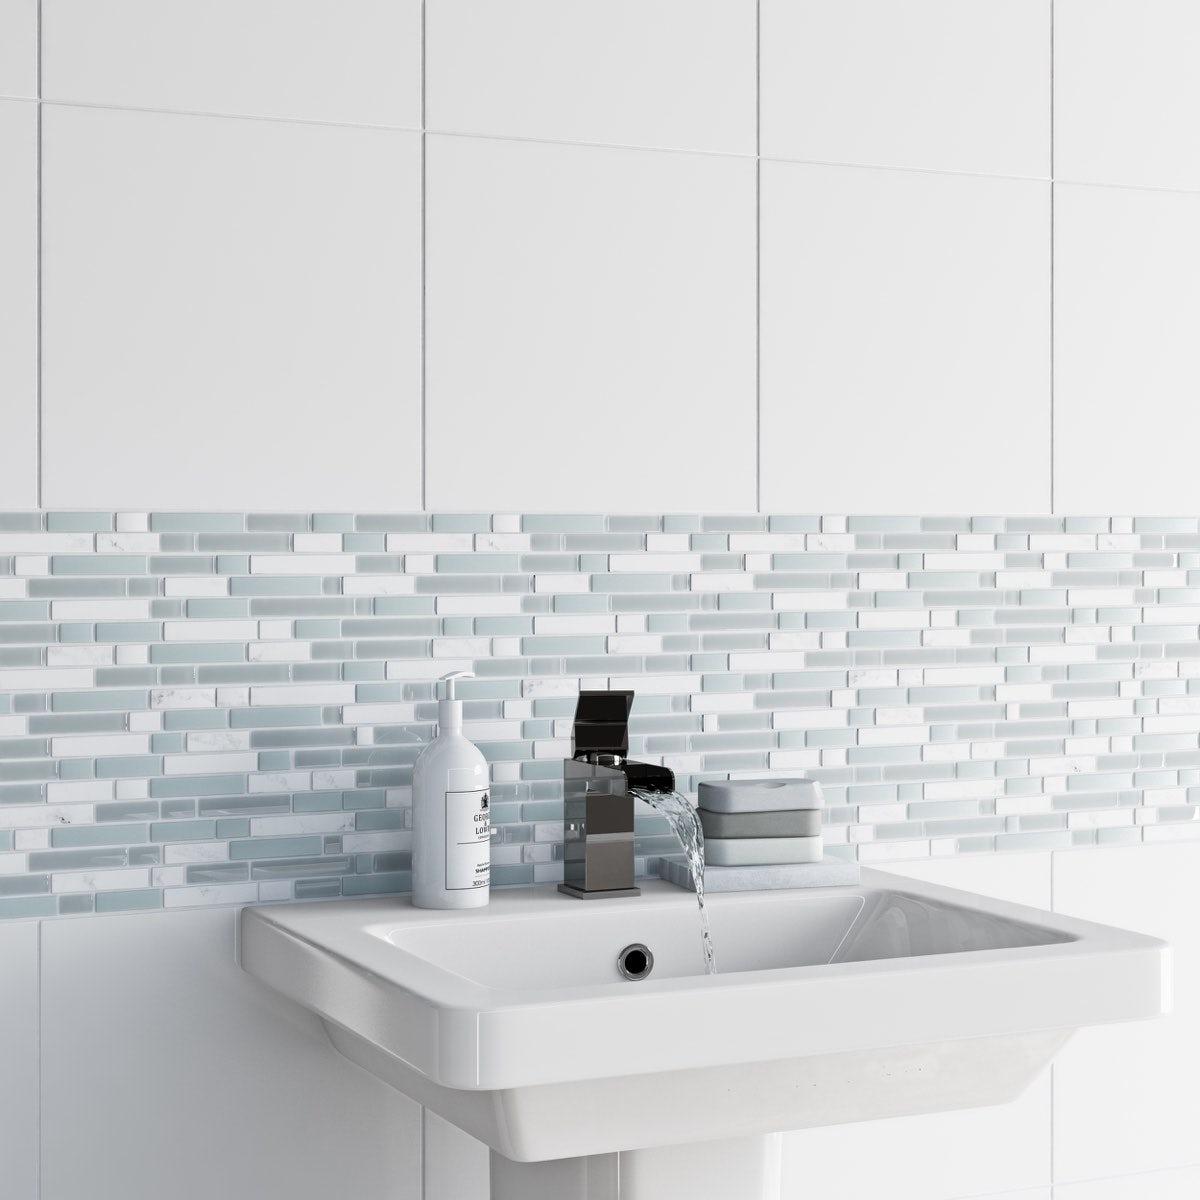 Heated Bathroom Tile: British Ceramic Tile Mosaic Ice White Gloss Tile 305mm X